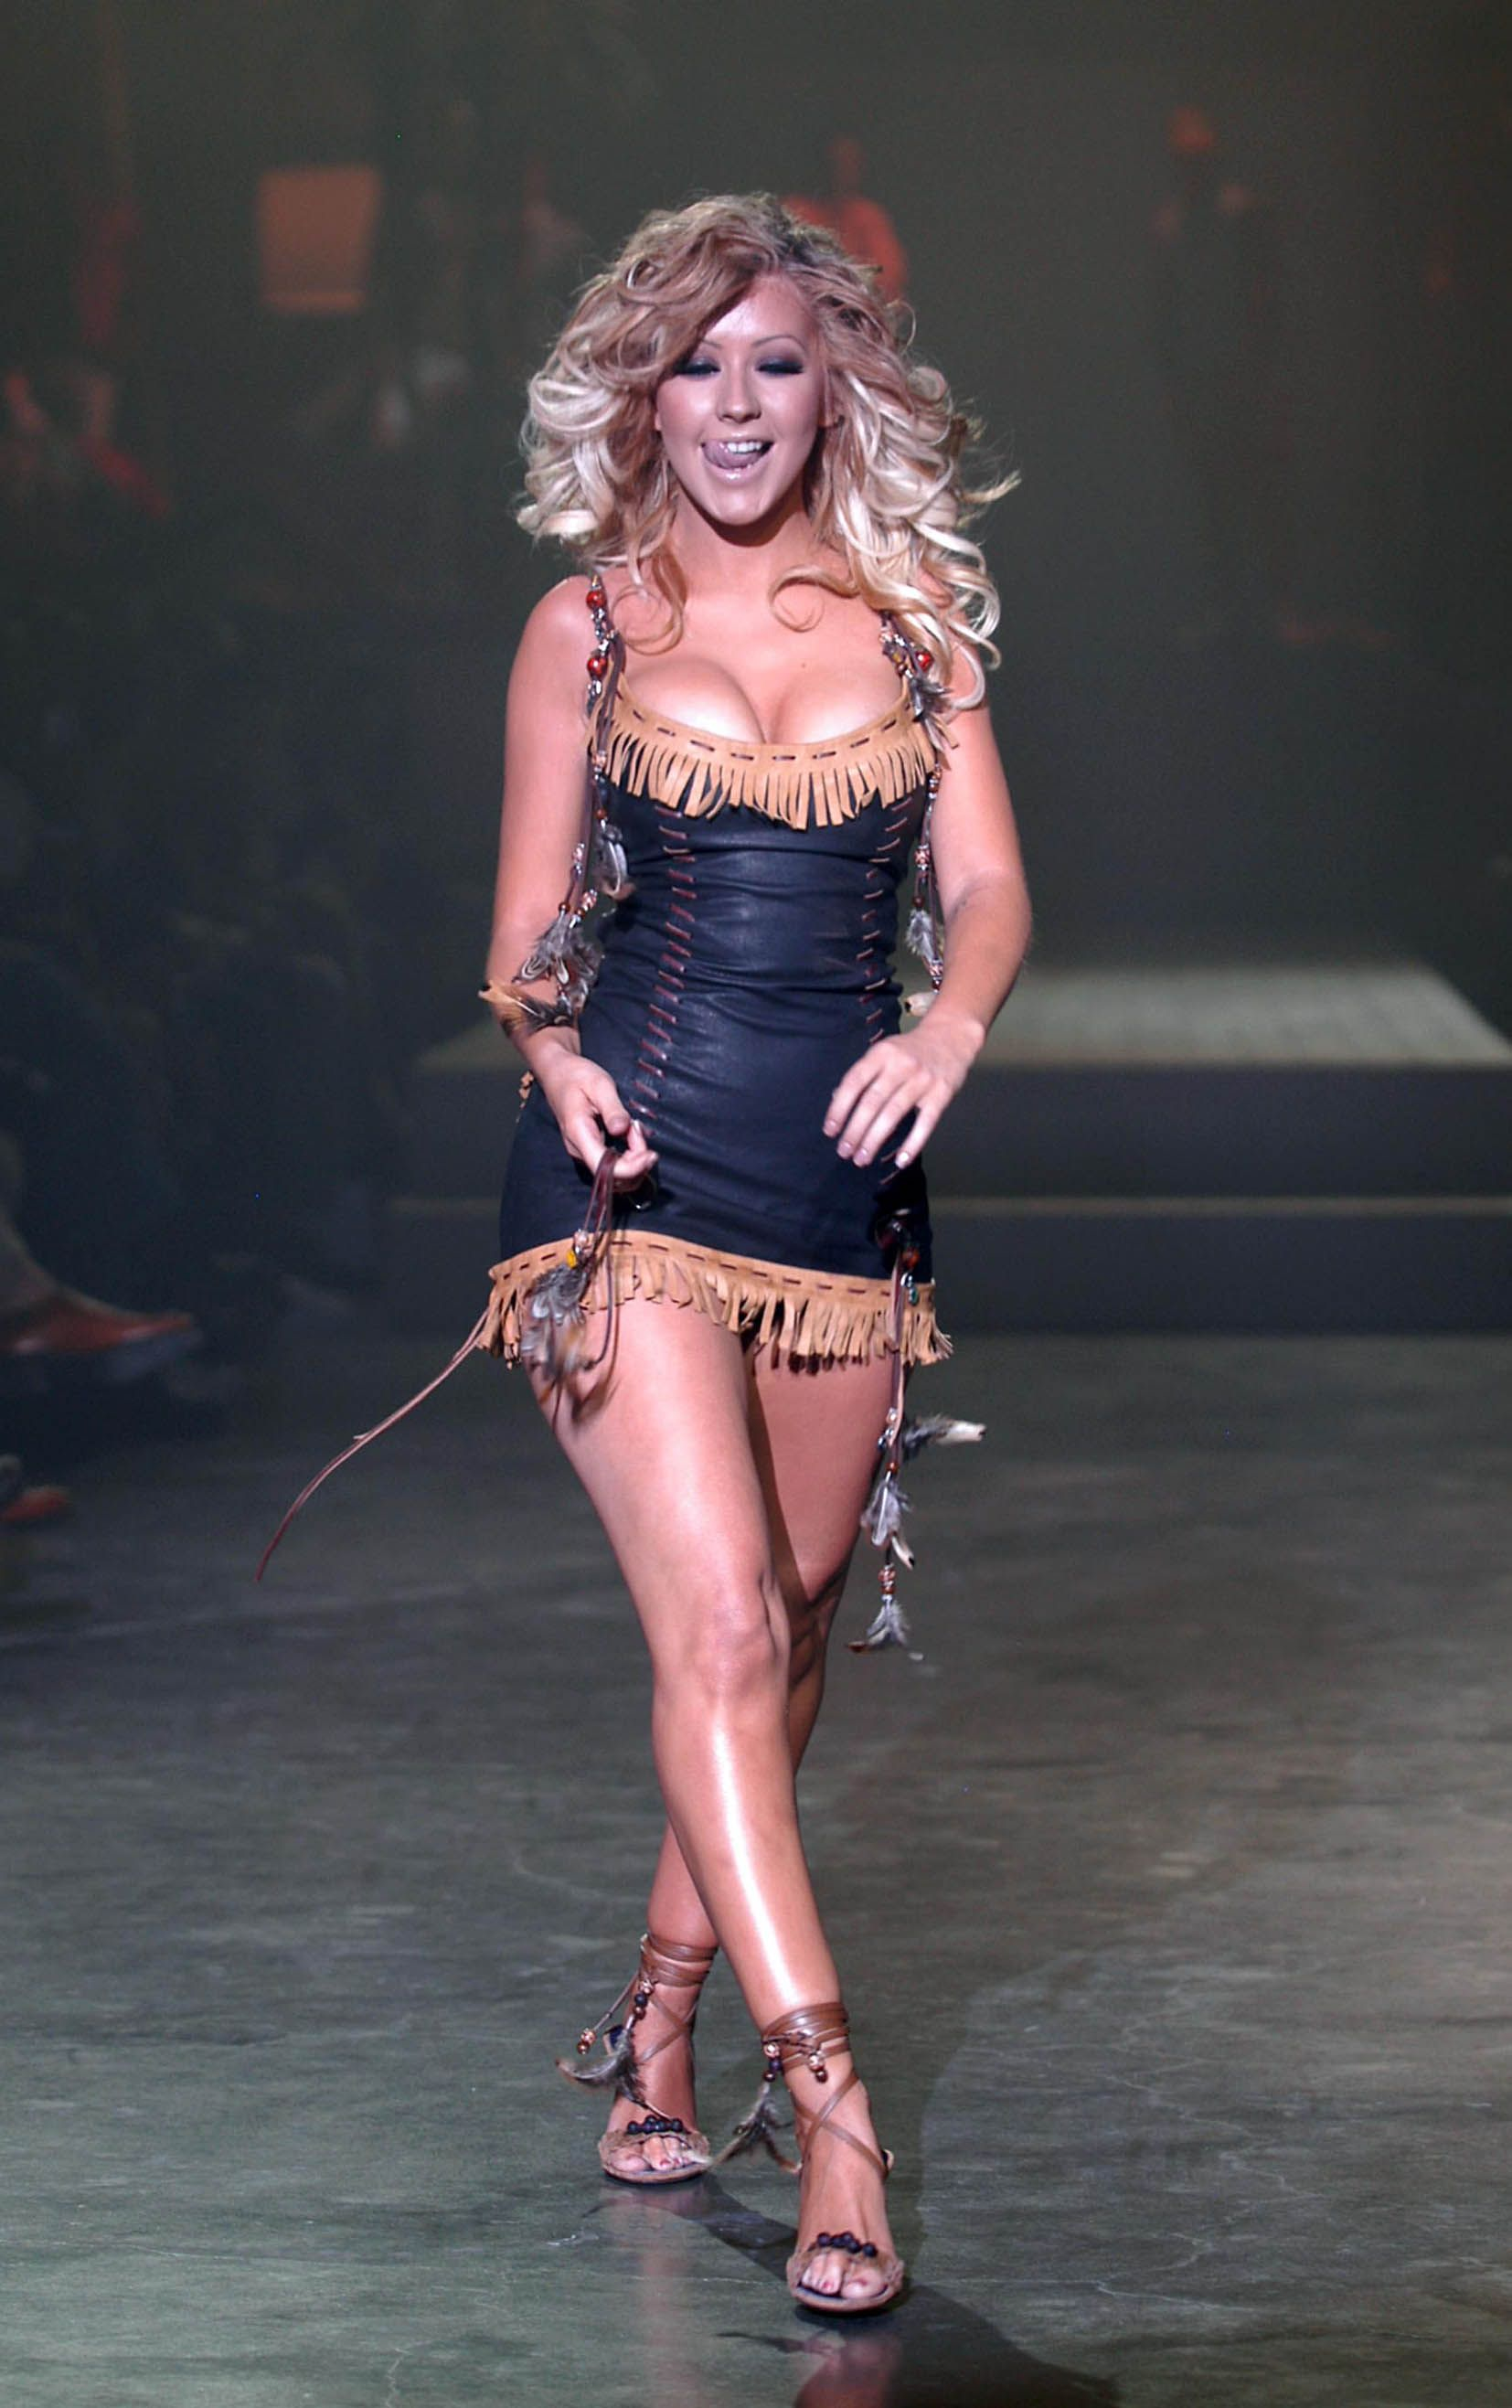 Christina aguilera fashion show 19